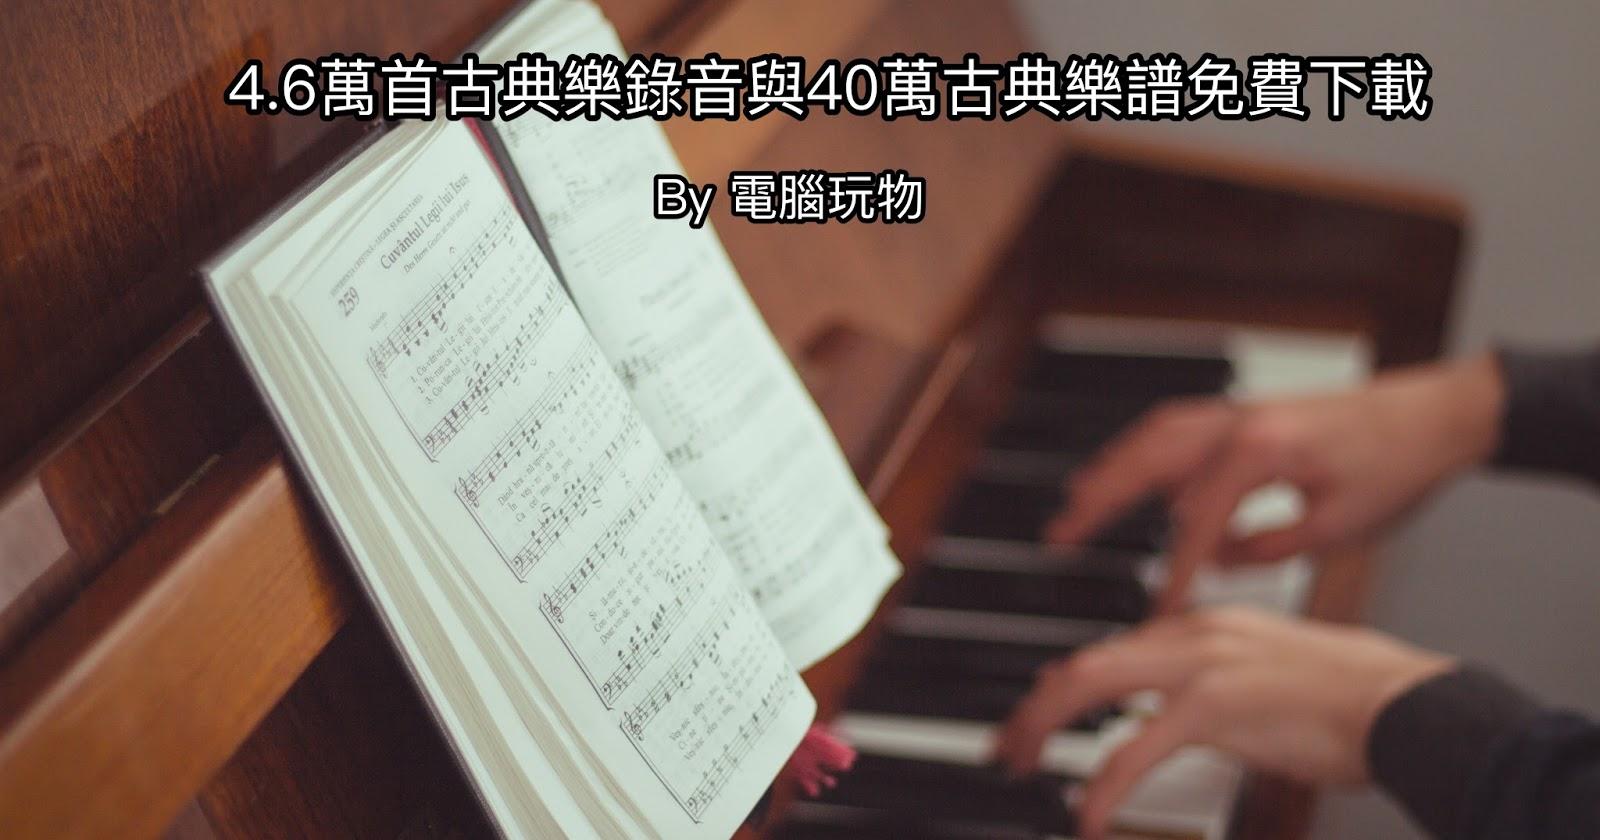 IMSLP 古典音樂圖書館:免費下載4.6萬錄音檔與40萬古典樂譜